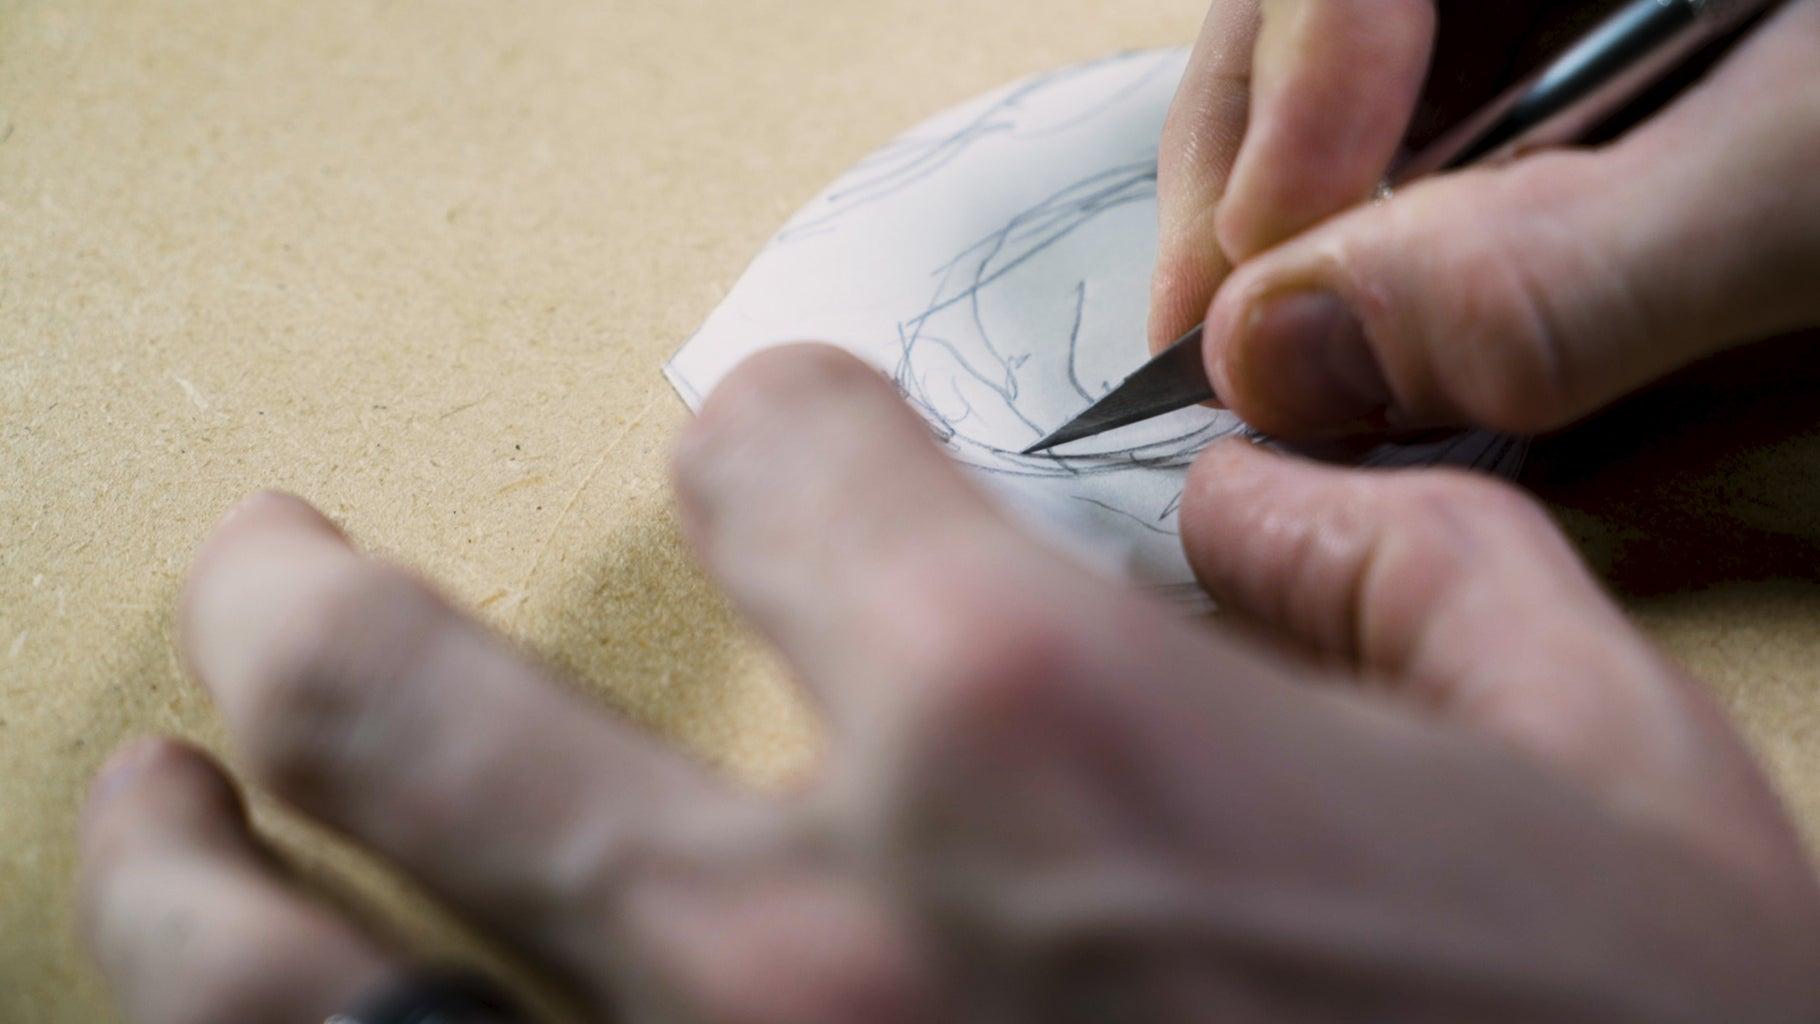 Cut Out a Paper Pattern